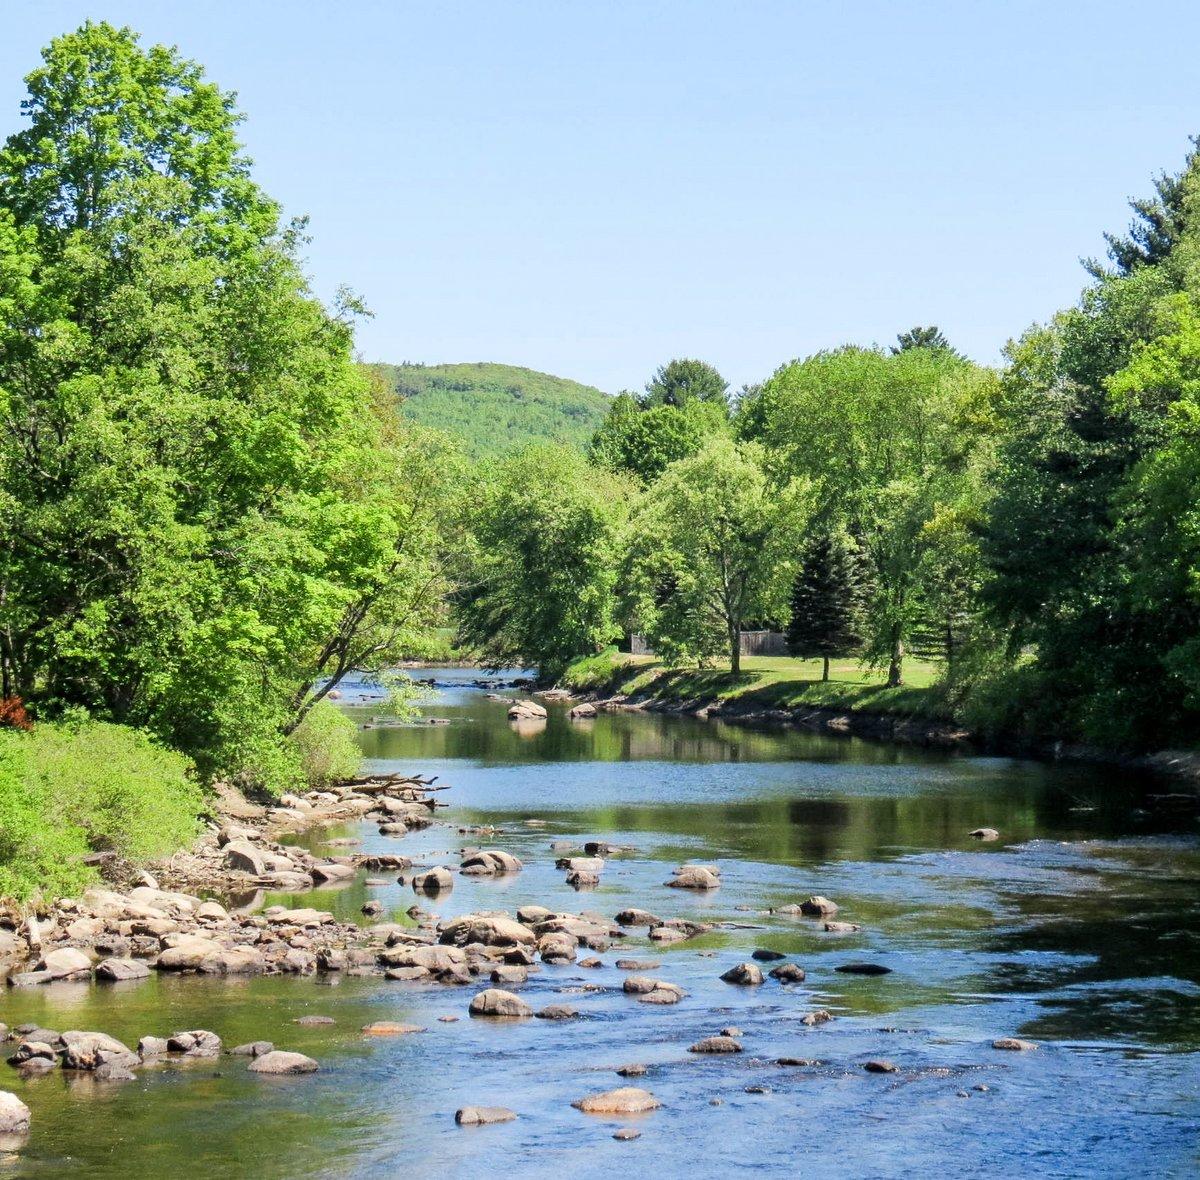 1. Ashuelot River on 5-23-15